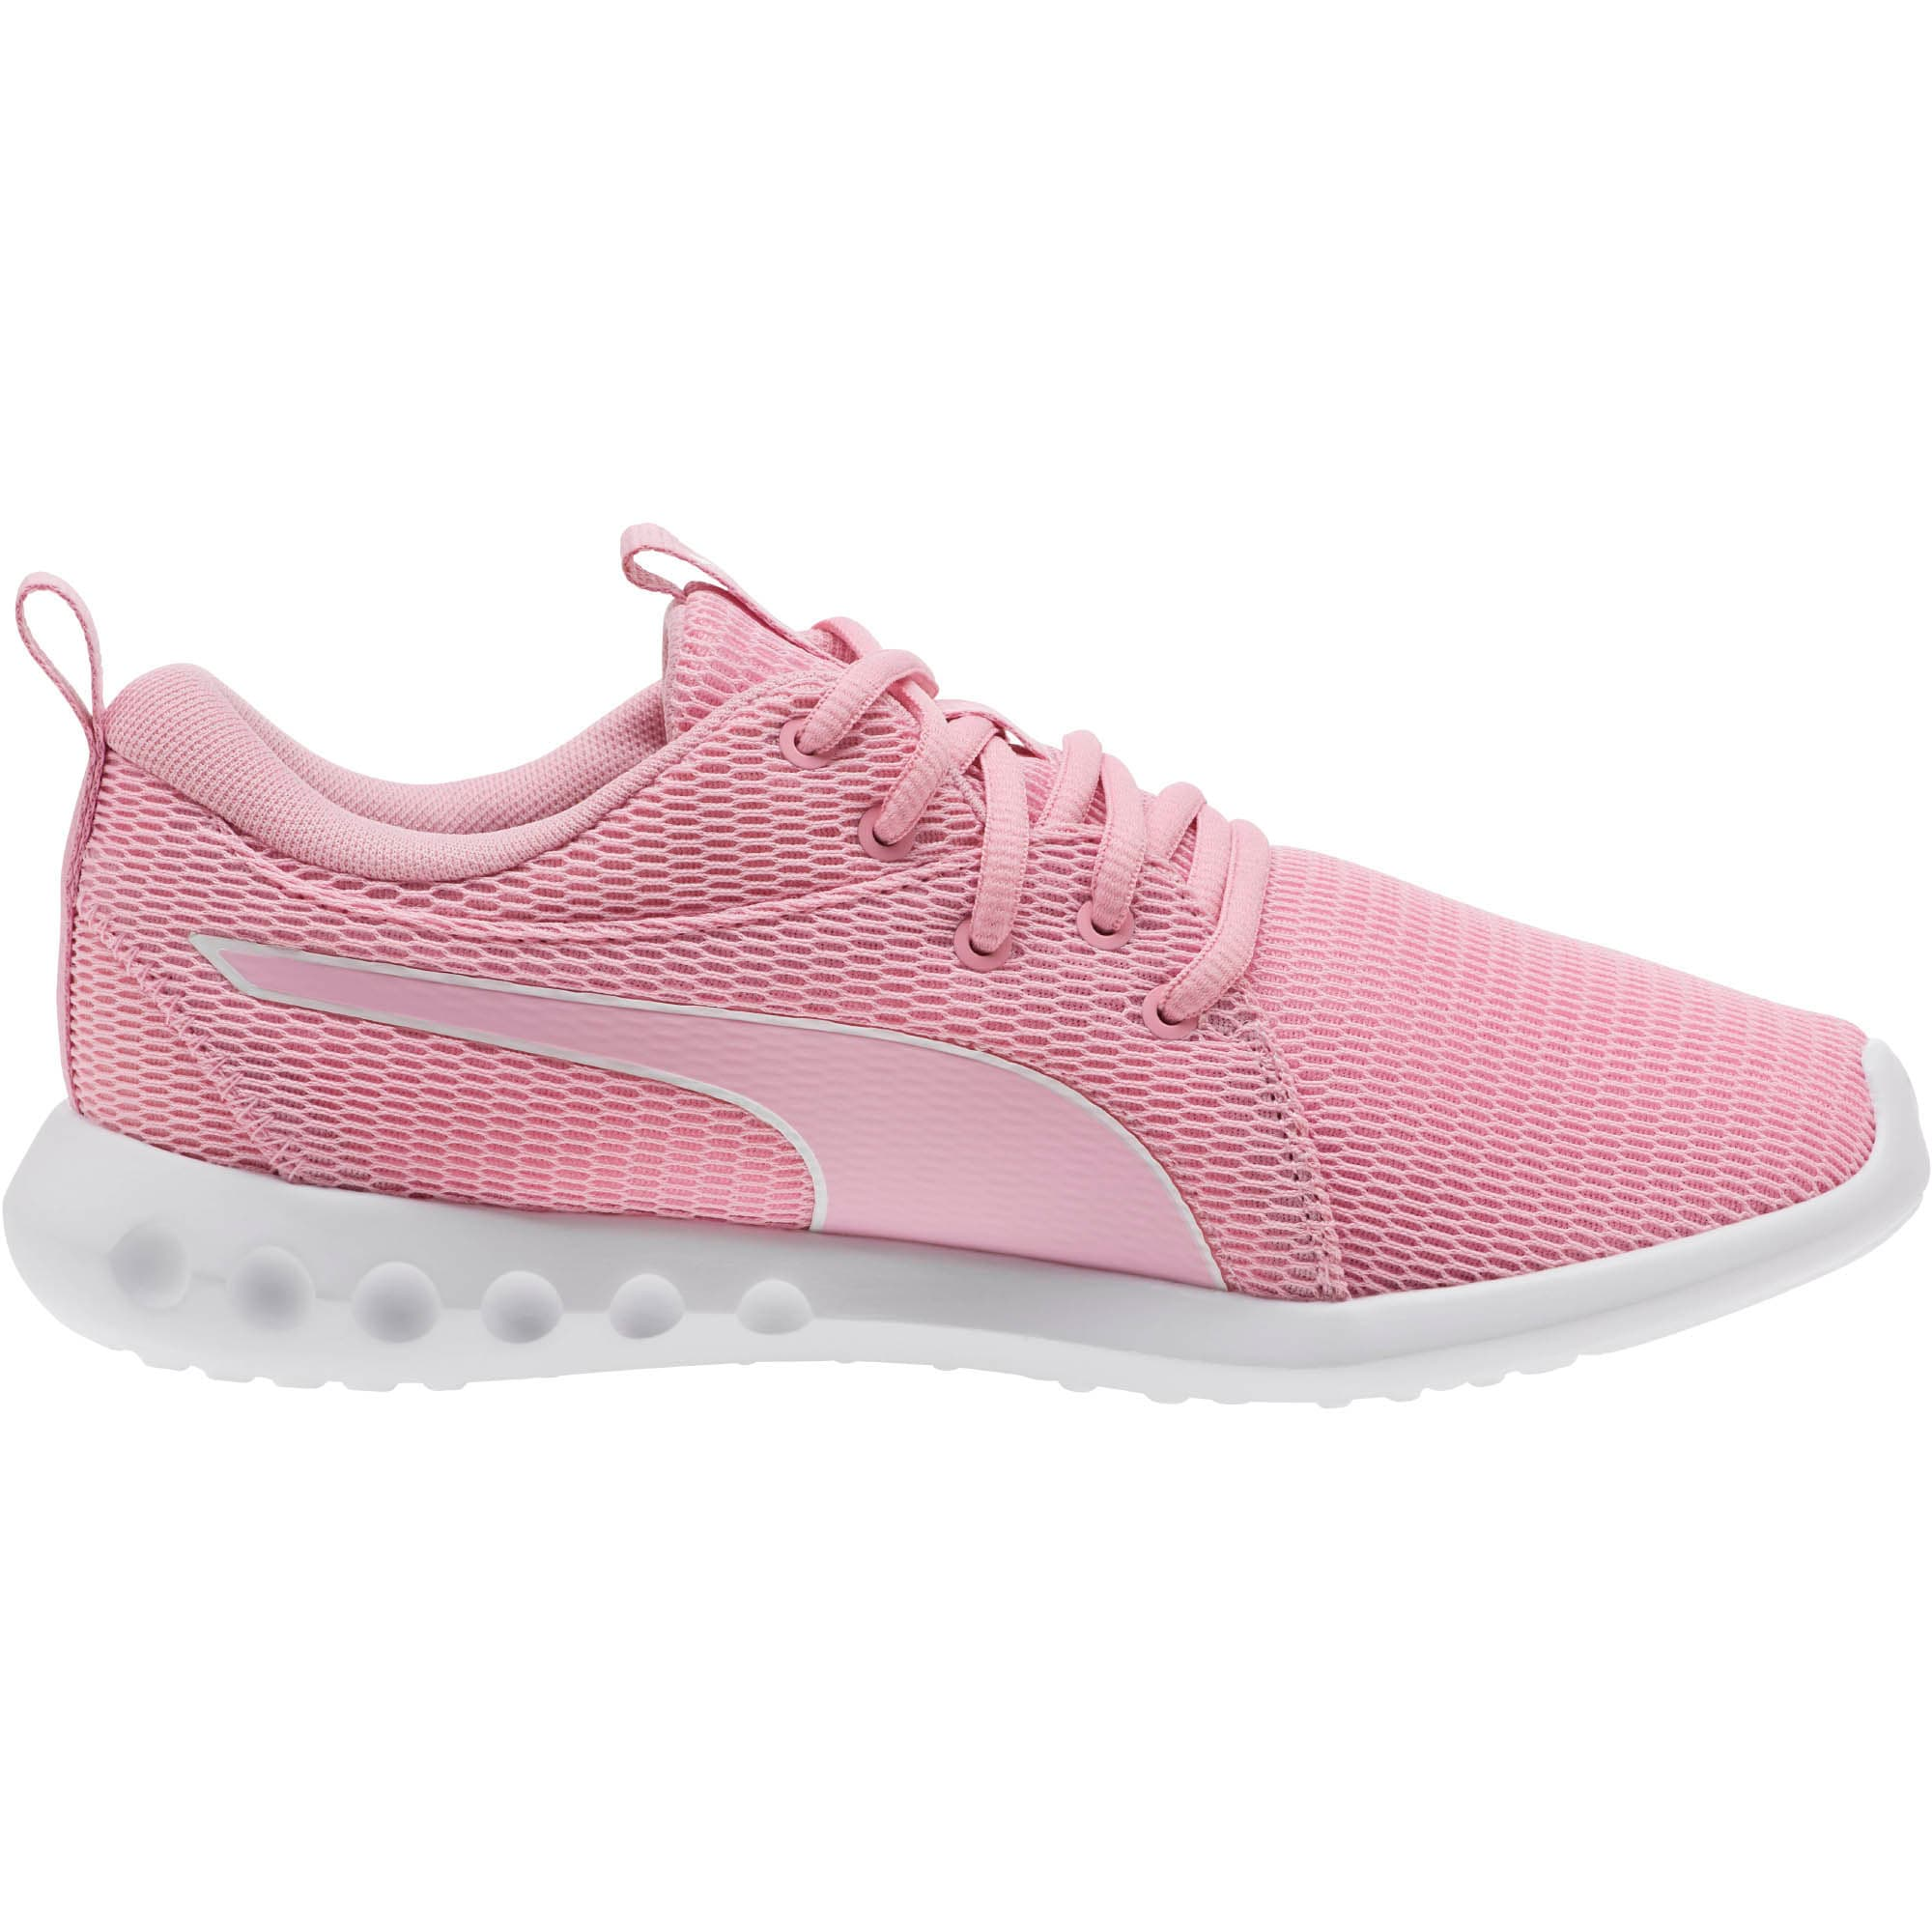 Thumbnail 3 of Carson 2 New Core Women's Training Shoes, Pale Pink-Puma White, medium